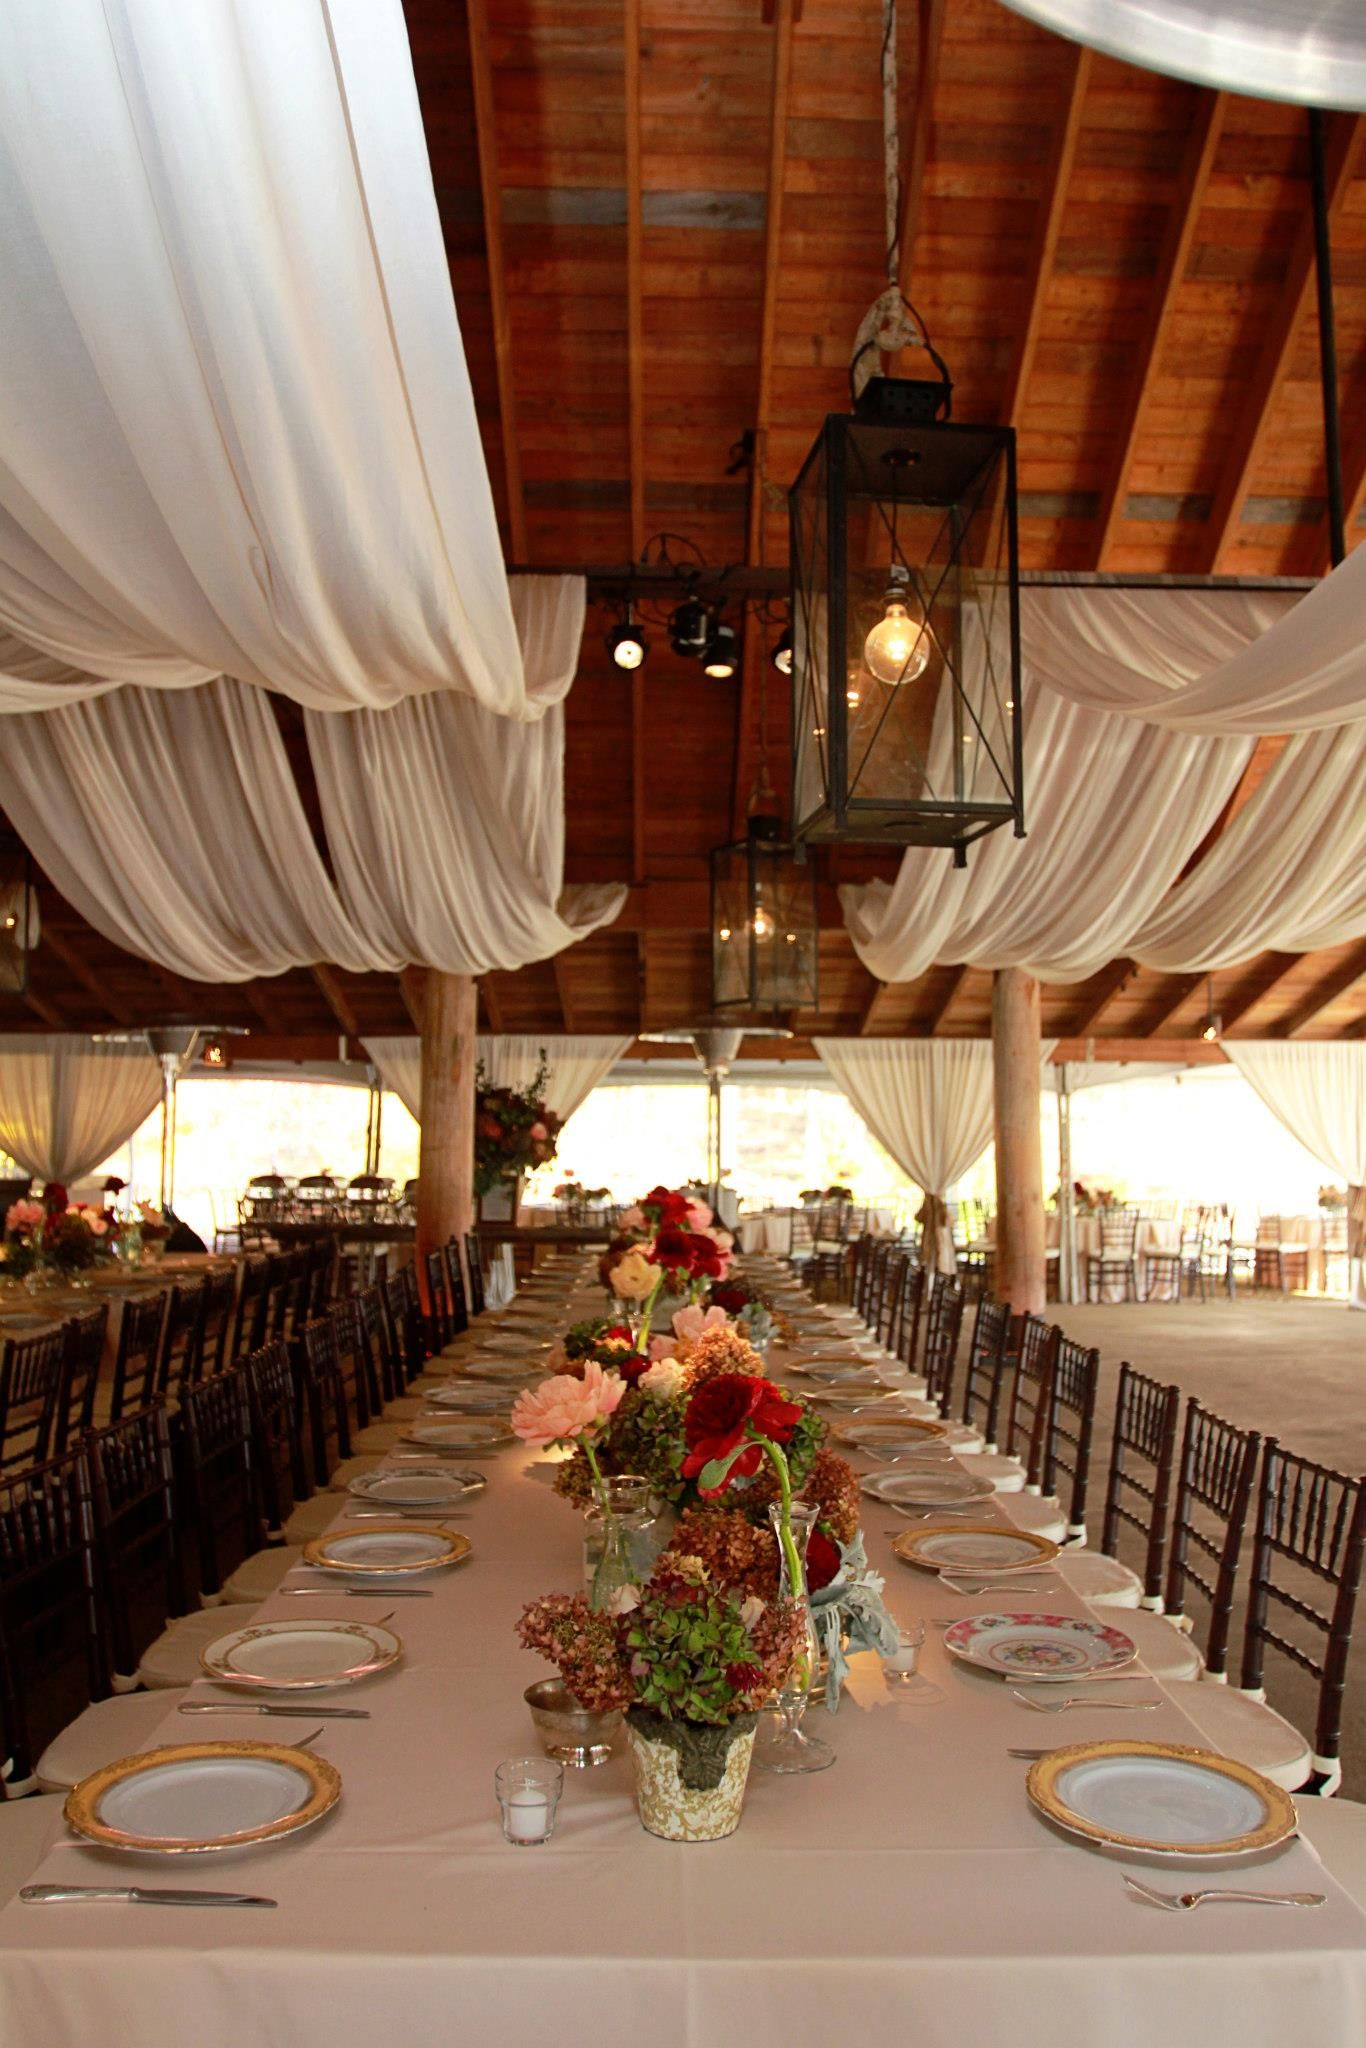 Draped fabric makes beautiful venue decoration For more ideas